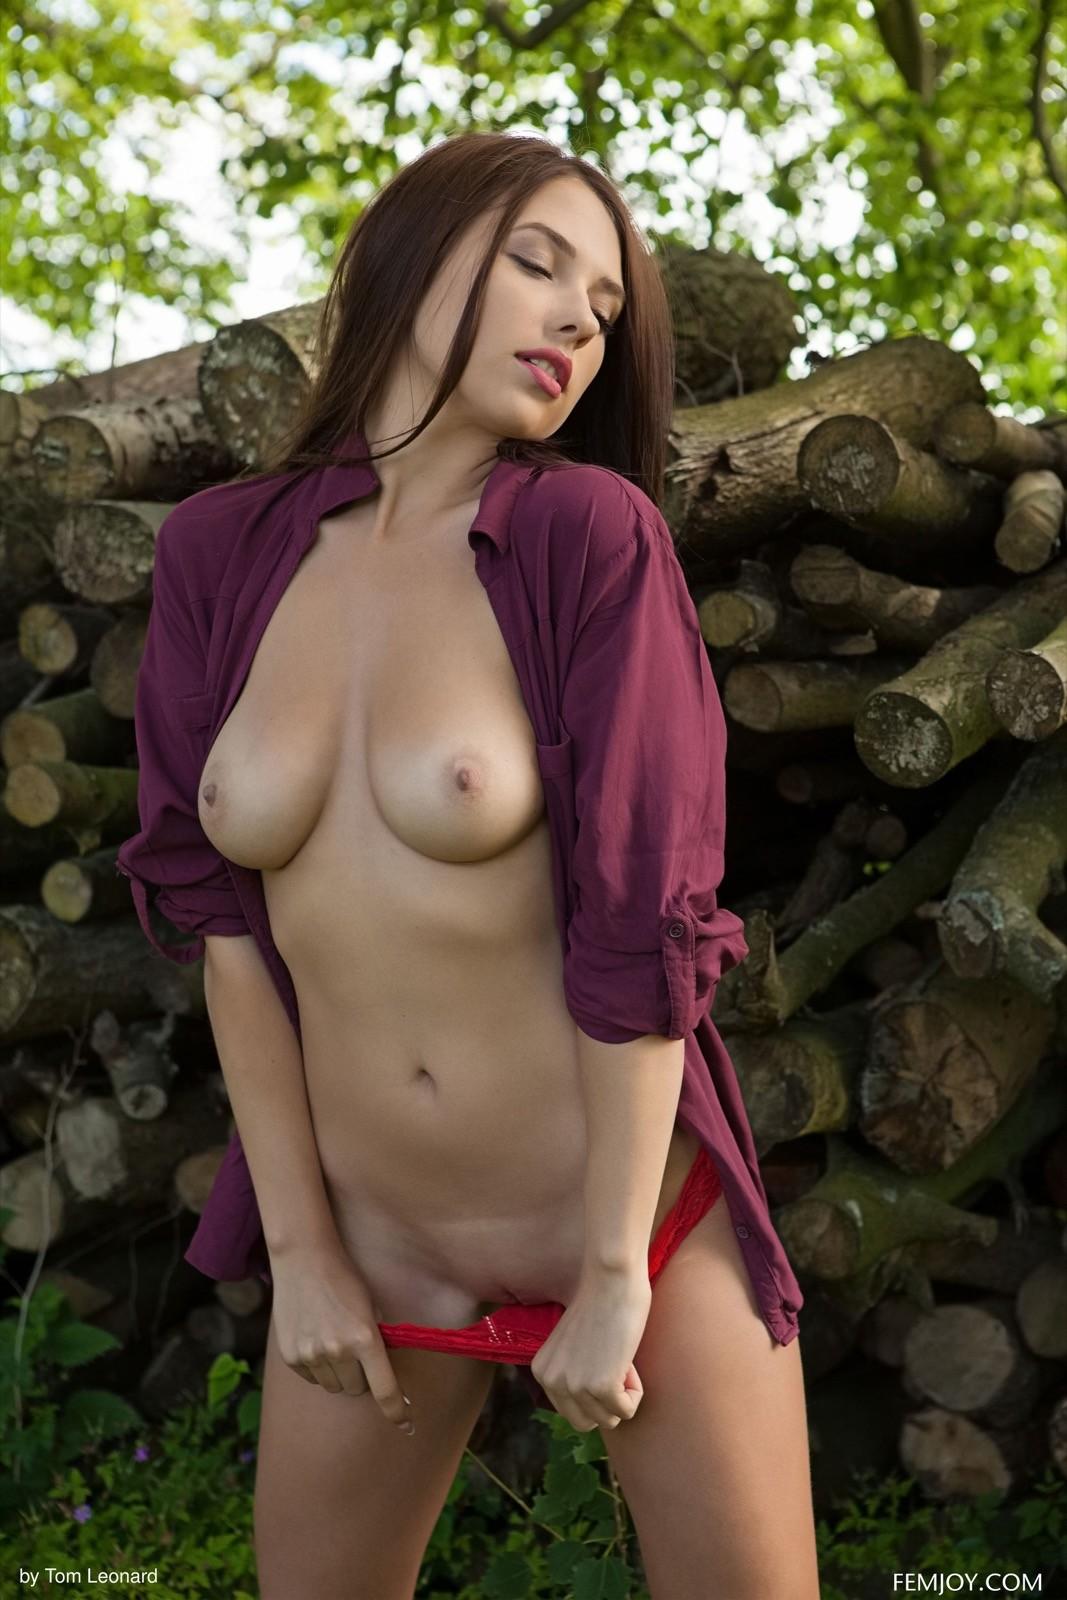 Шатенка в рубашке и трусах  - фото